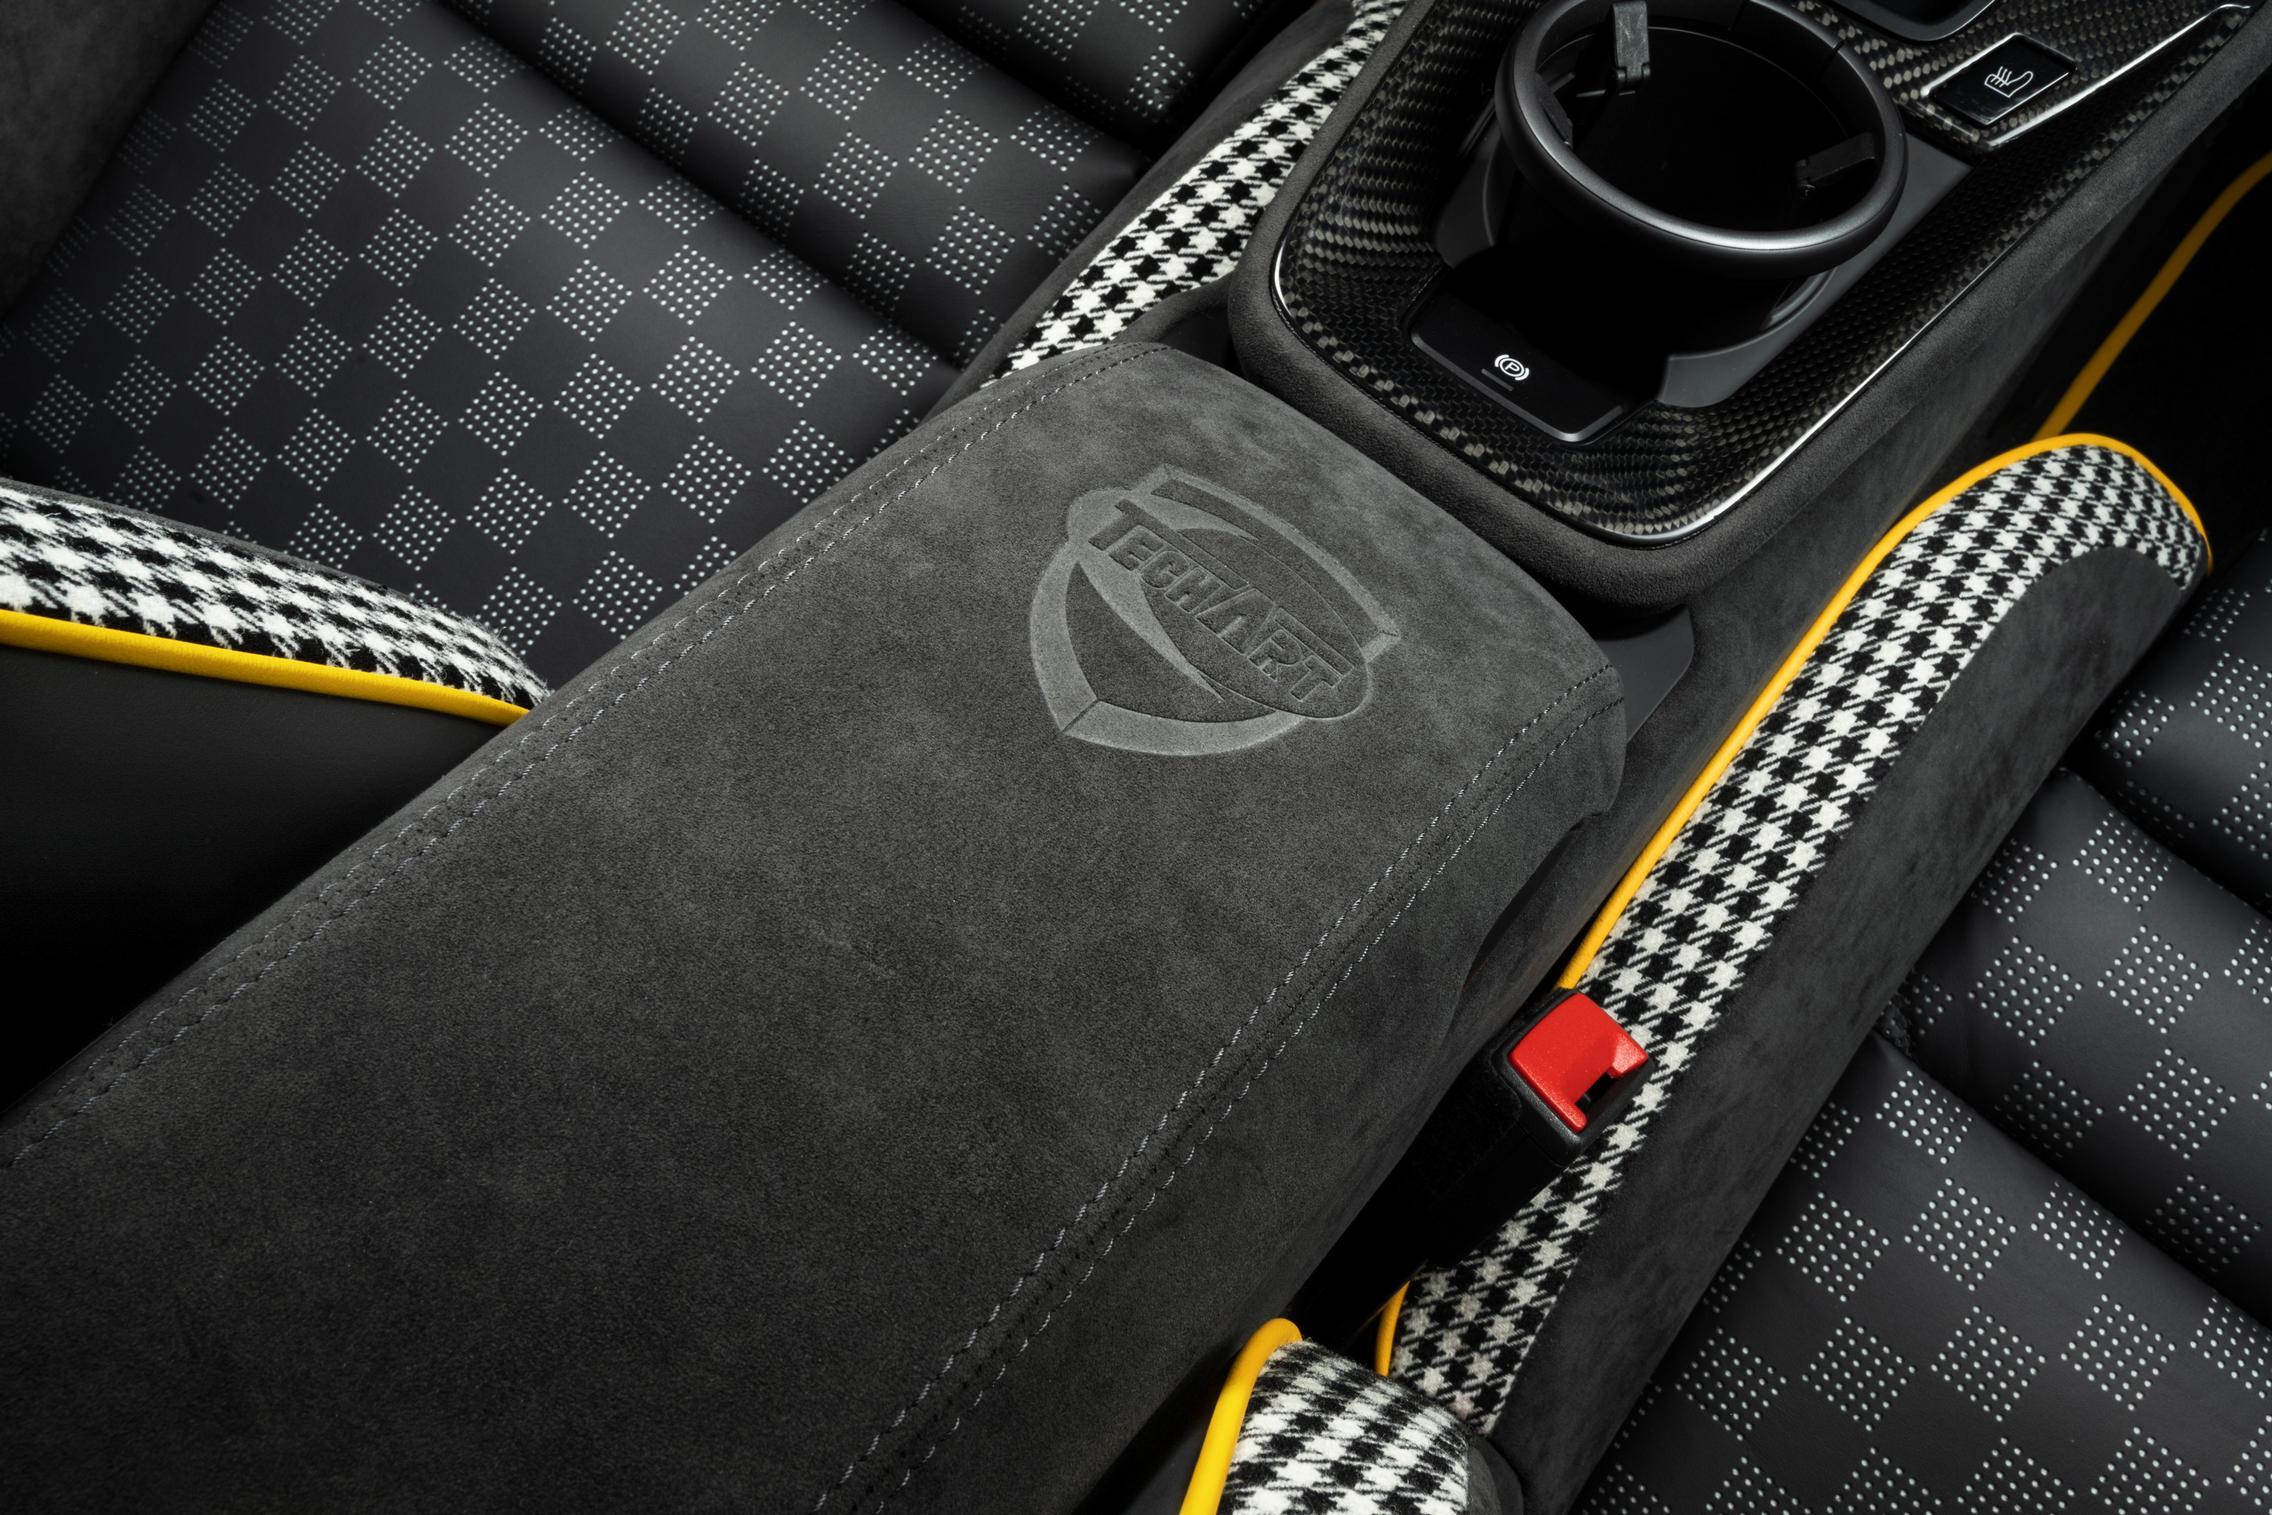 Techart GTstreet R armrest